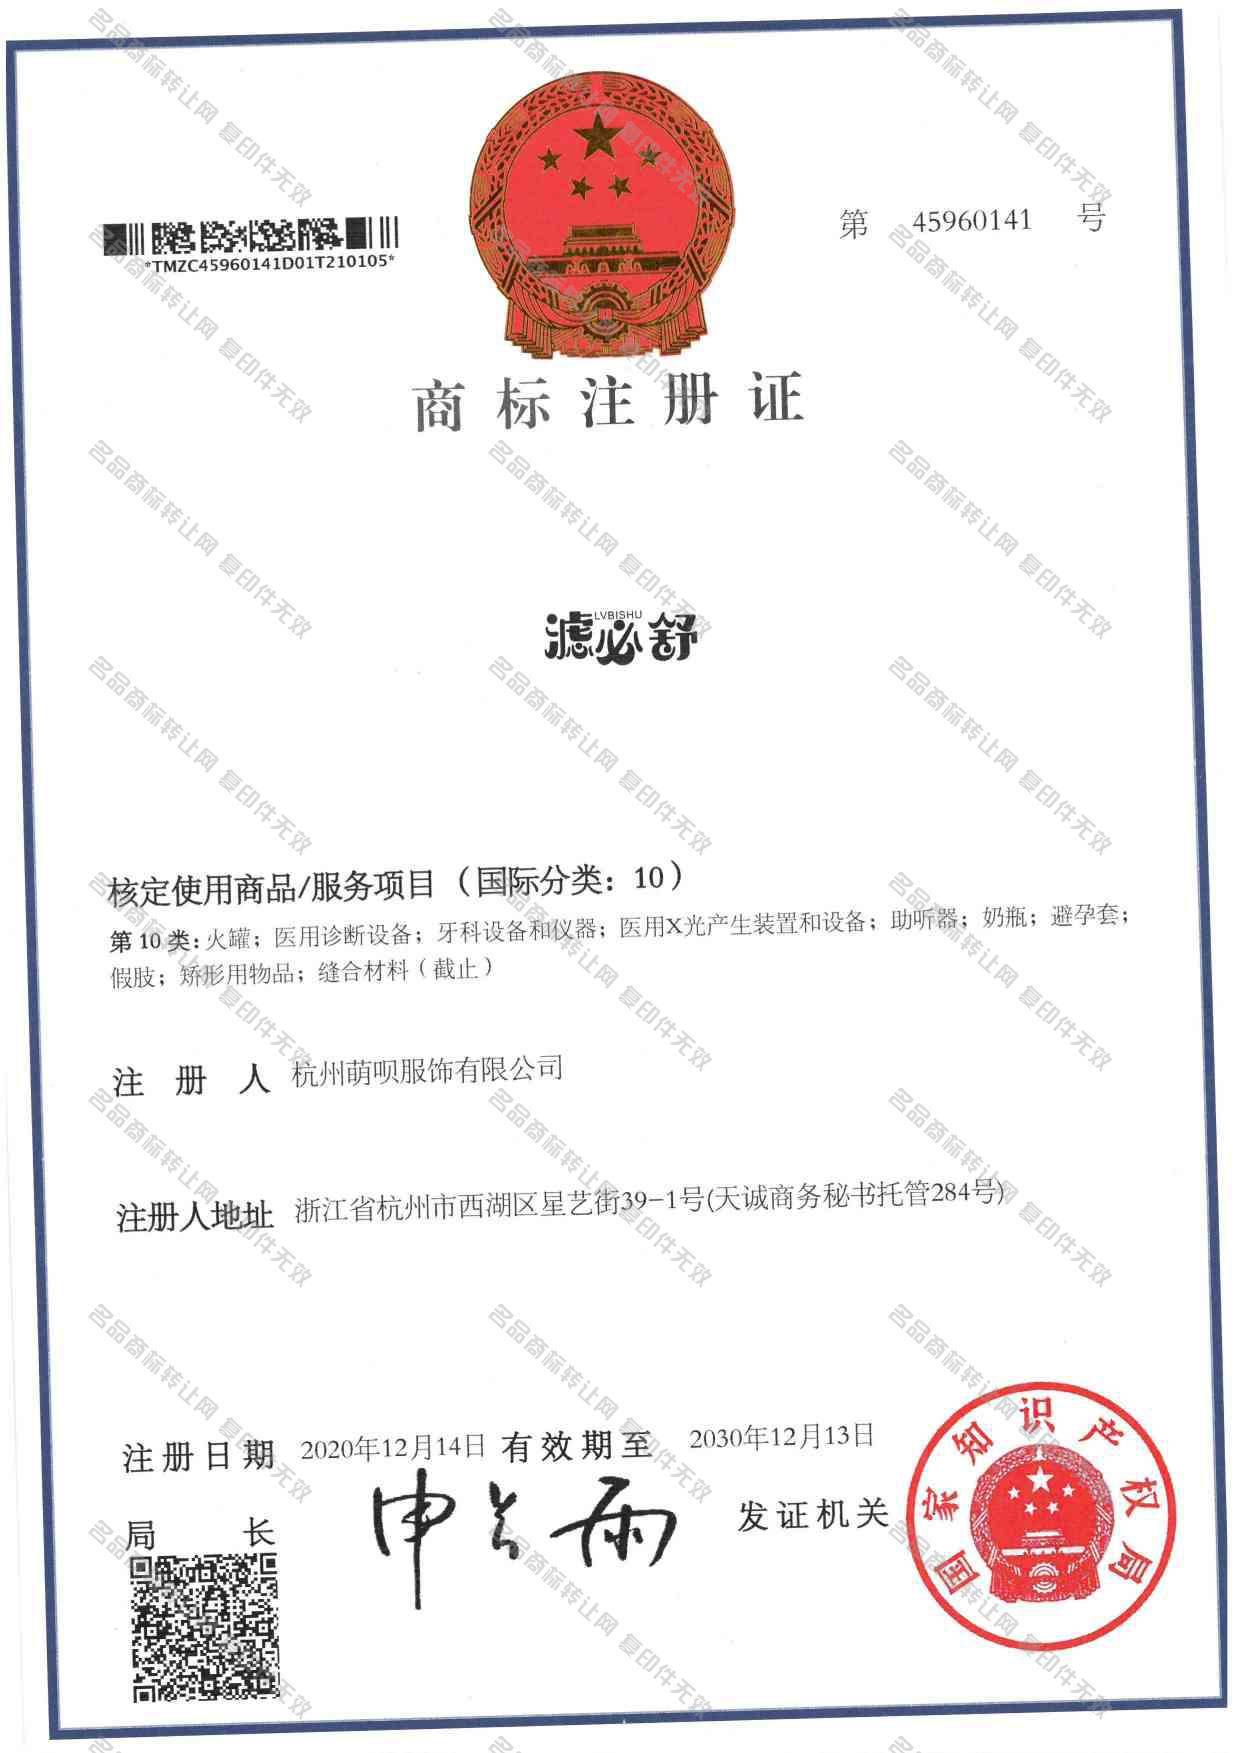 滤必舒;LVBISHU注册证